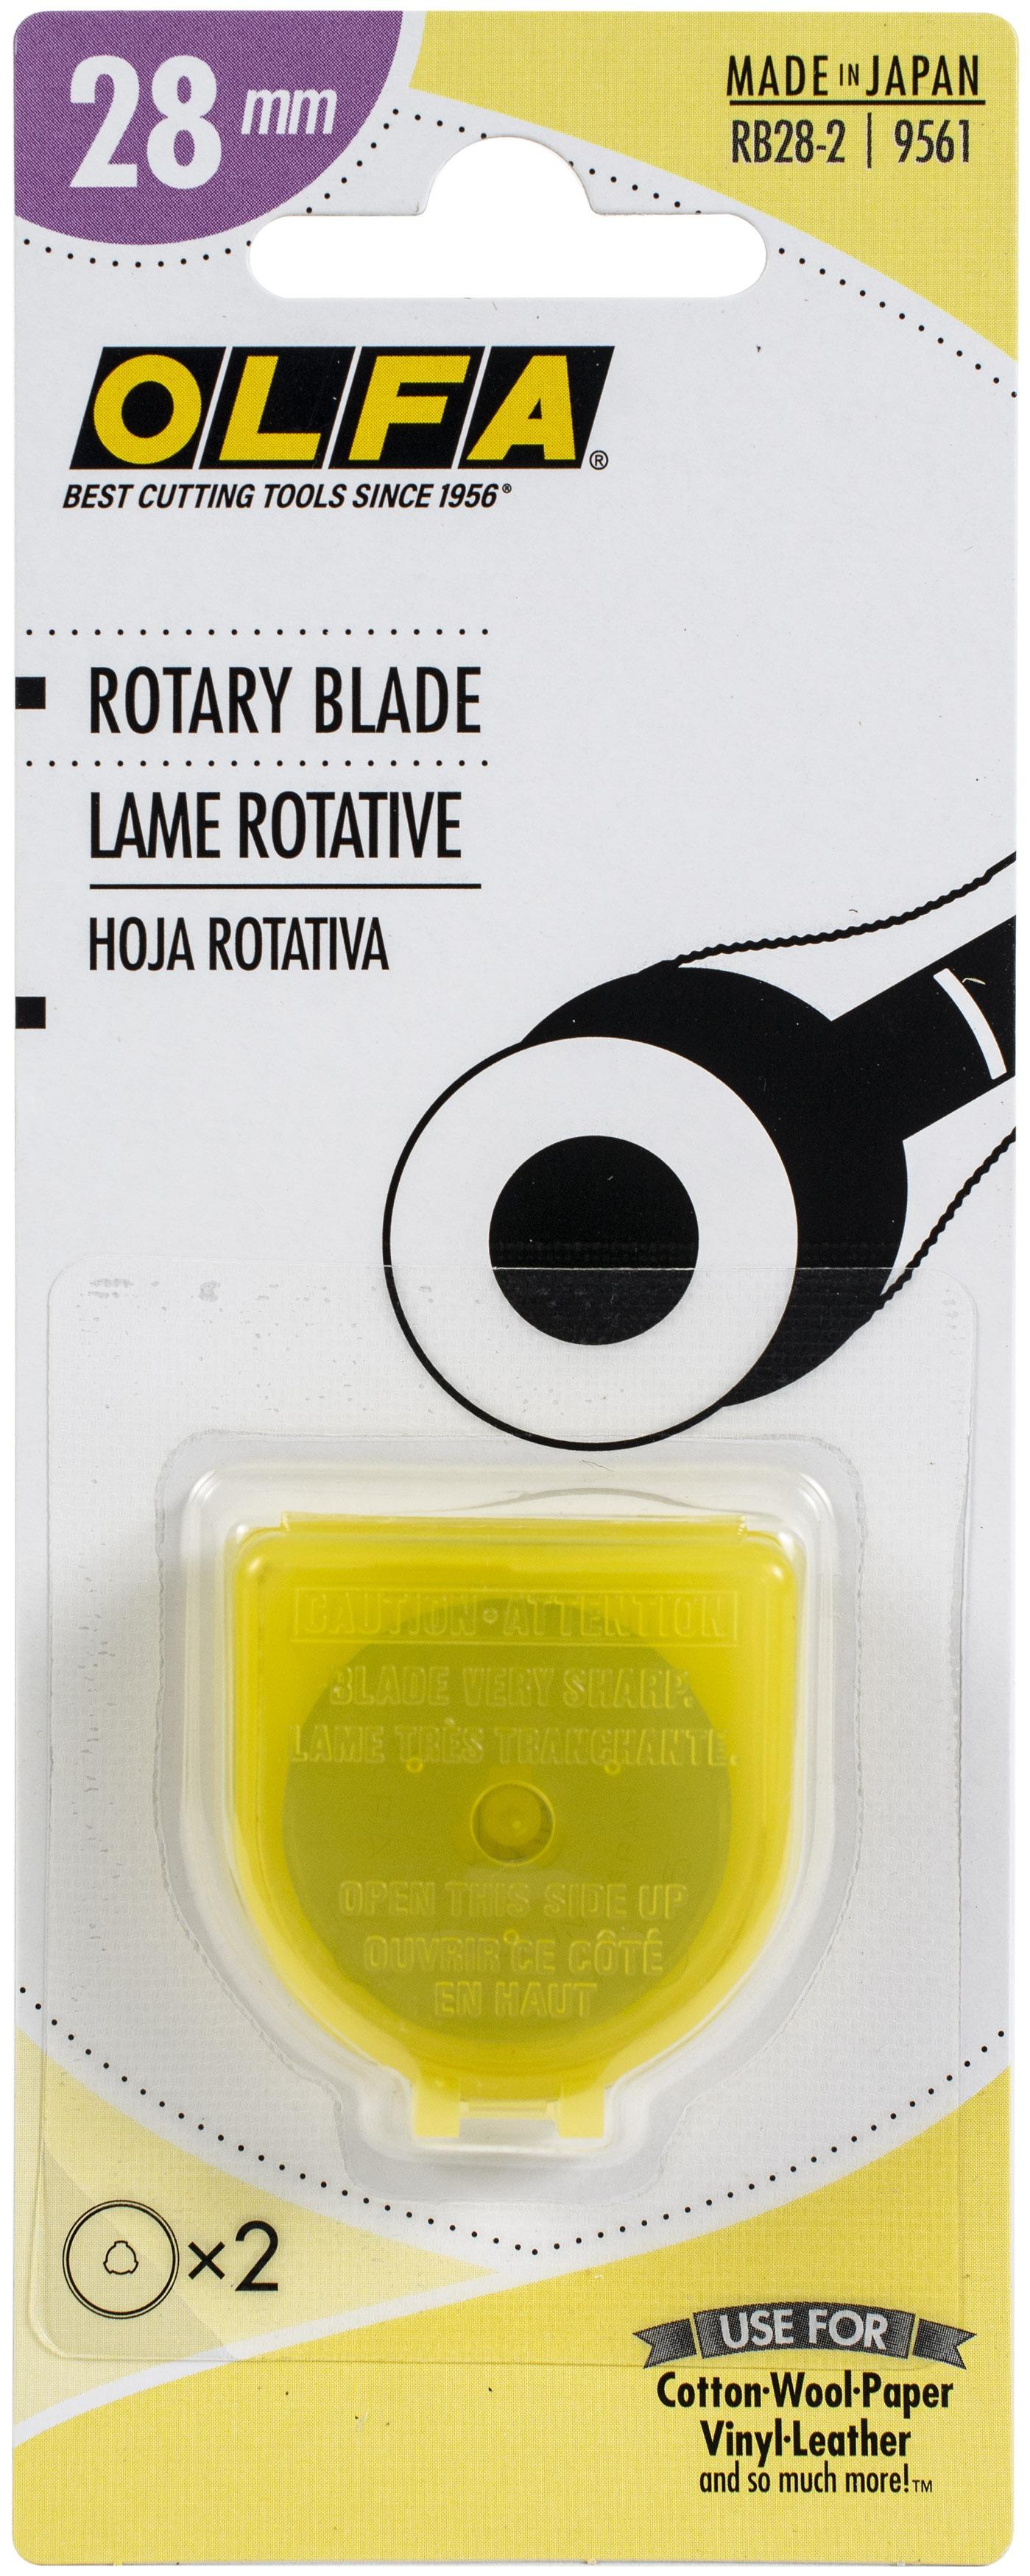 OLFA Rotary Blade Refill 28mm 2/Pkg-